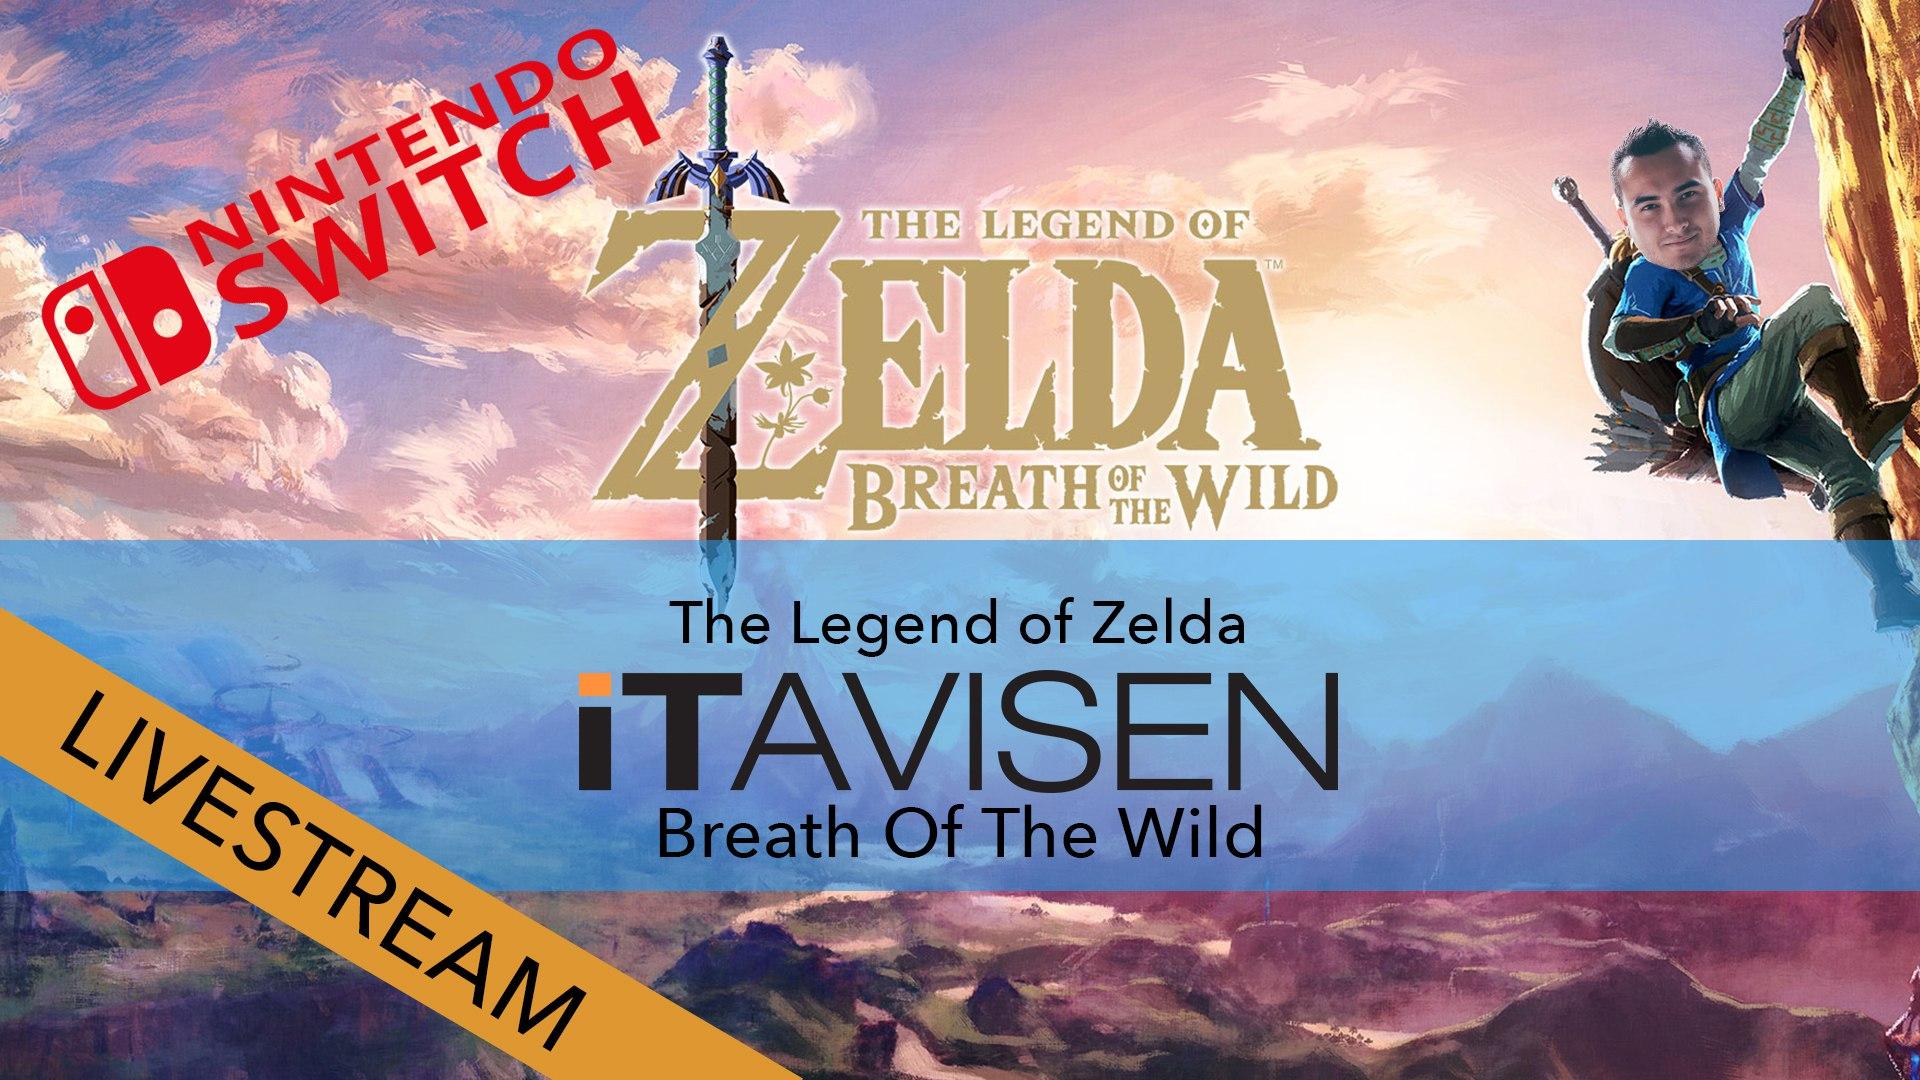 Vi direkstrømmer årets store Nintendo-spill på Nintendo Switch.